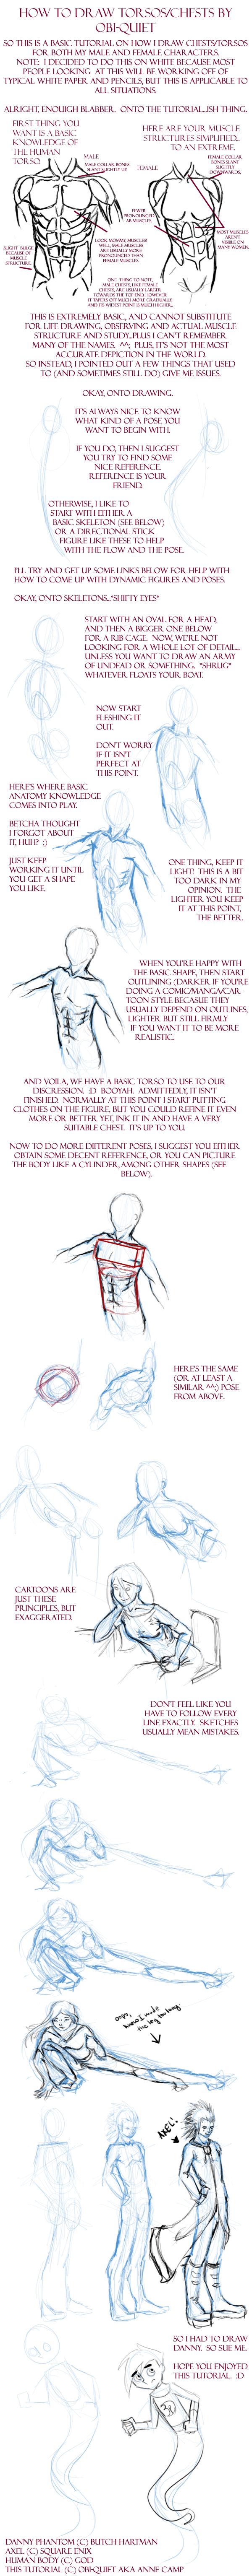 How to draw human torsos by Obi-quiet